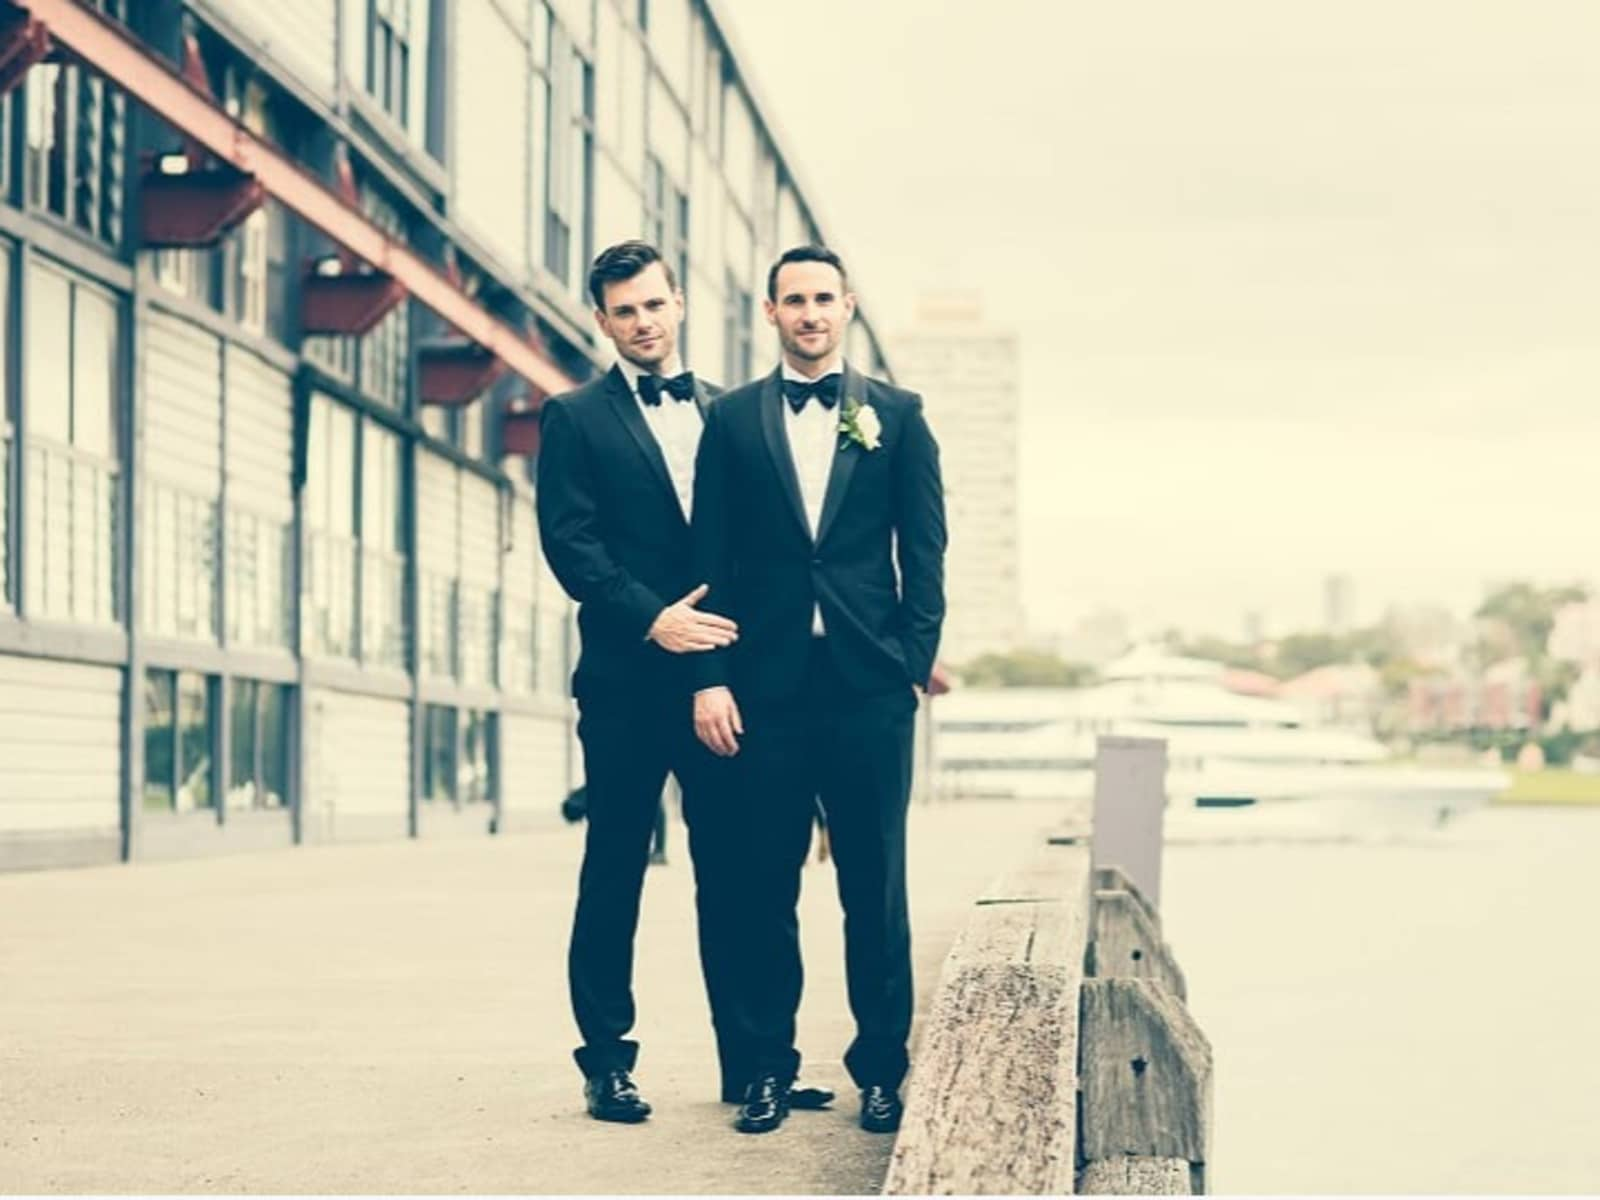 Nick & Joshua from London, United Kingdom